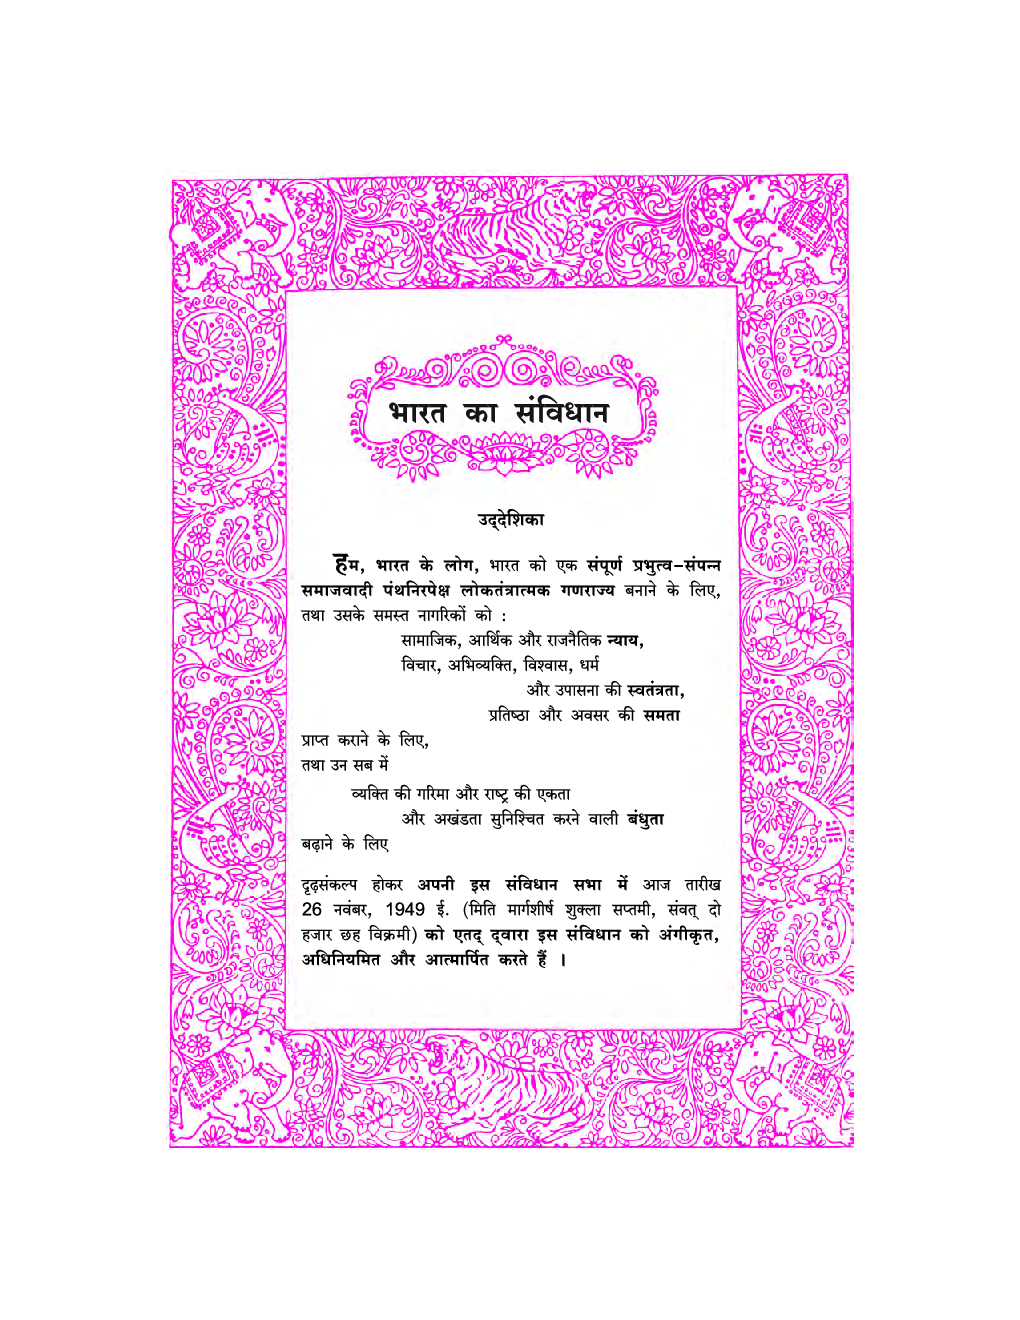 Maharashtra School Textbook बालभारती For Class-4 - Page 4